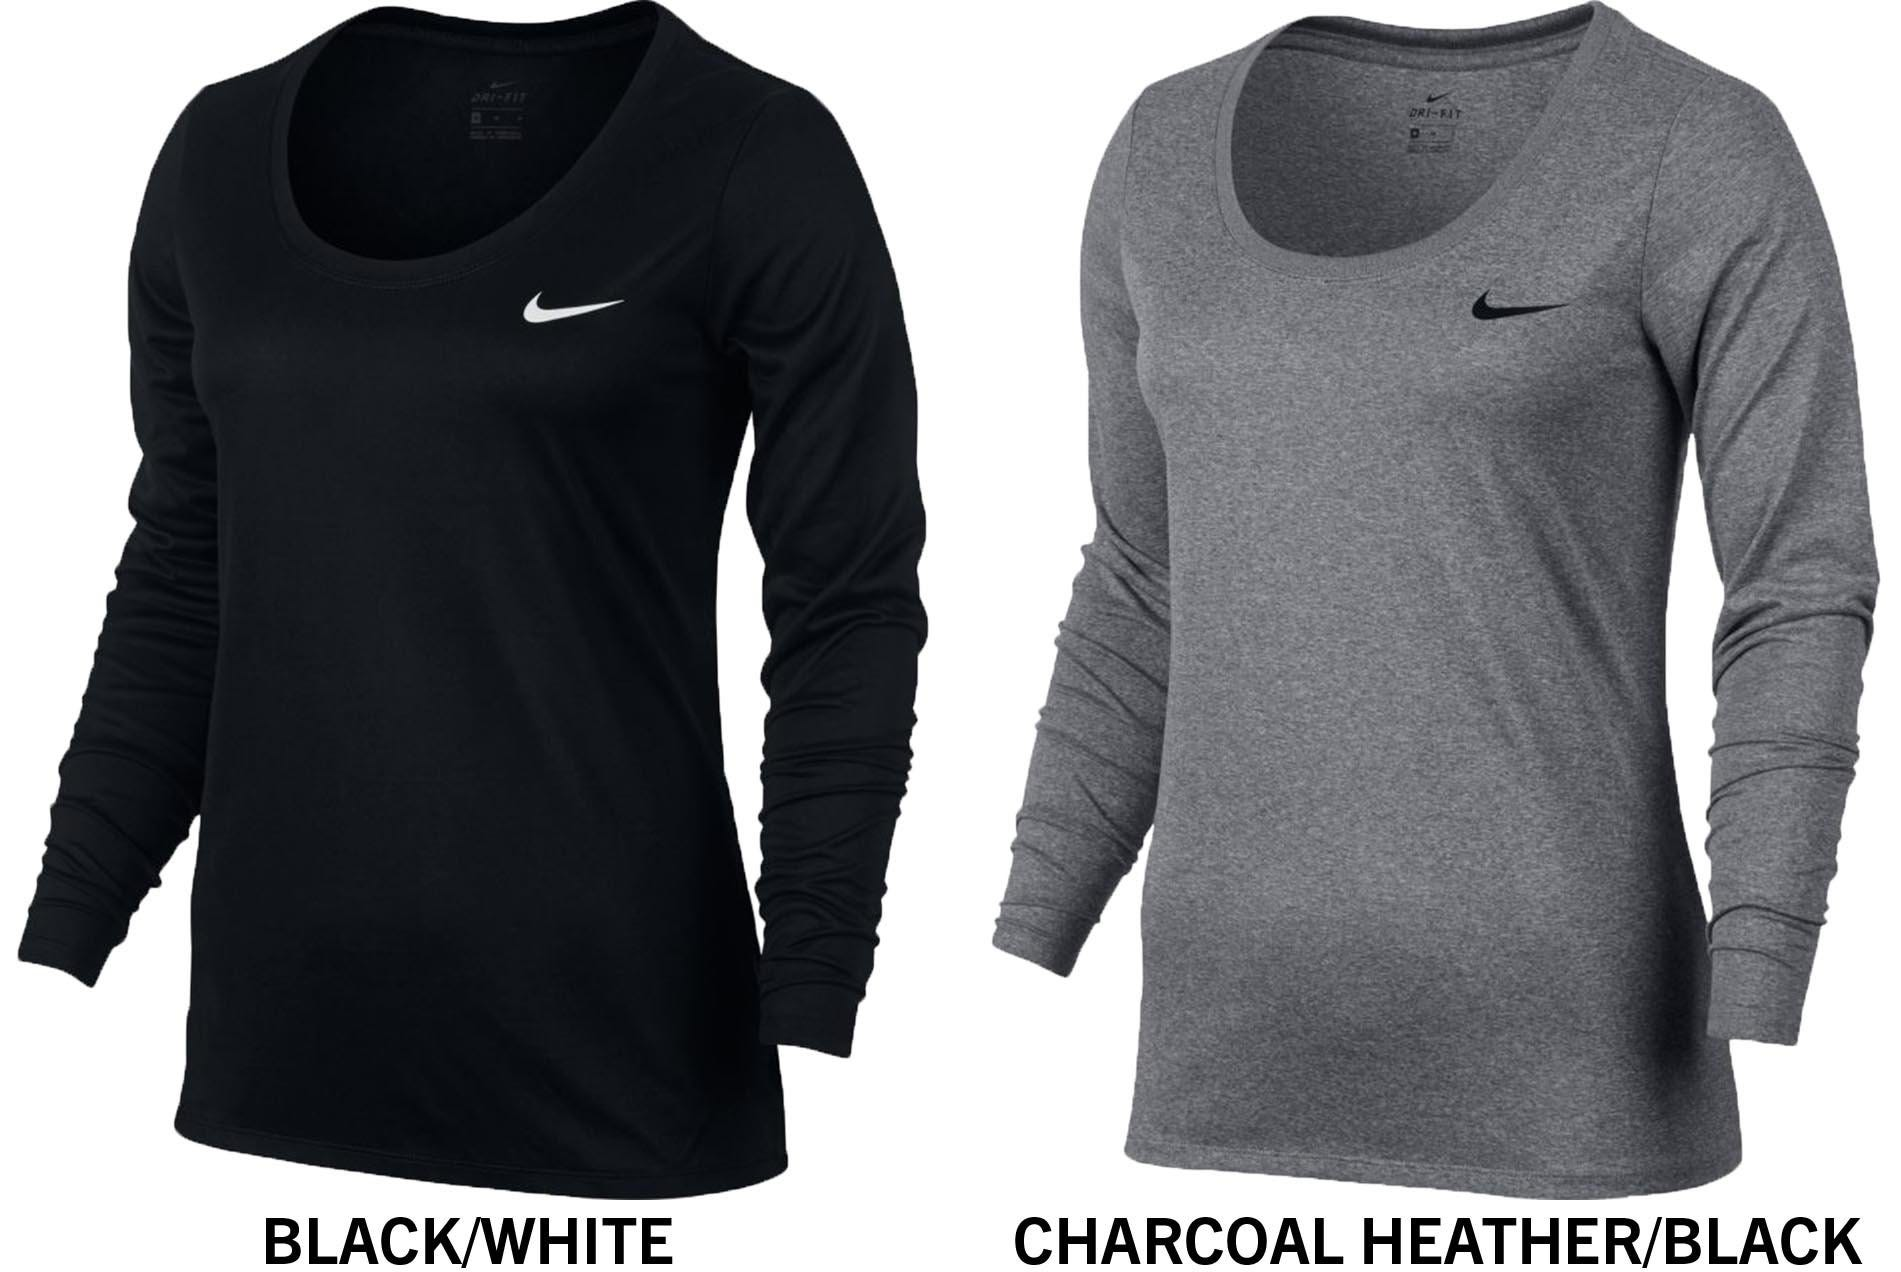 52496c8cb93 Nike Dri-FIT Legend Women s Long Sleeve Training T-Shirt